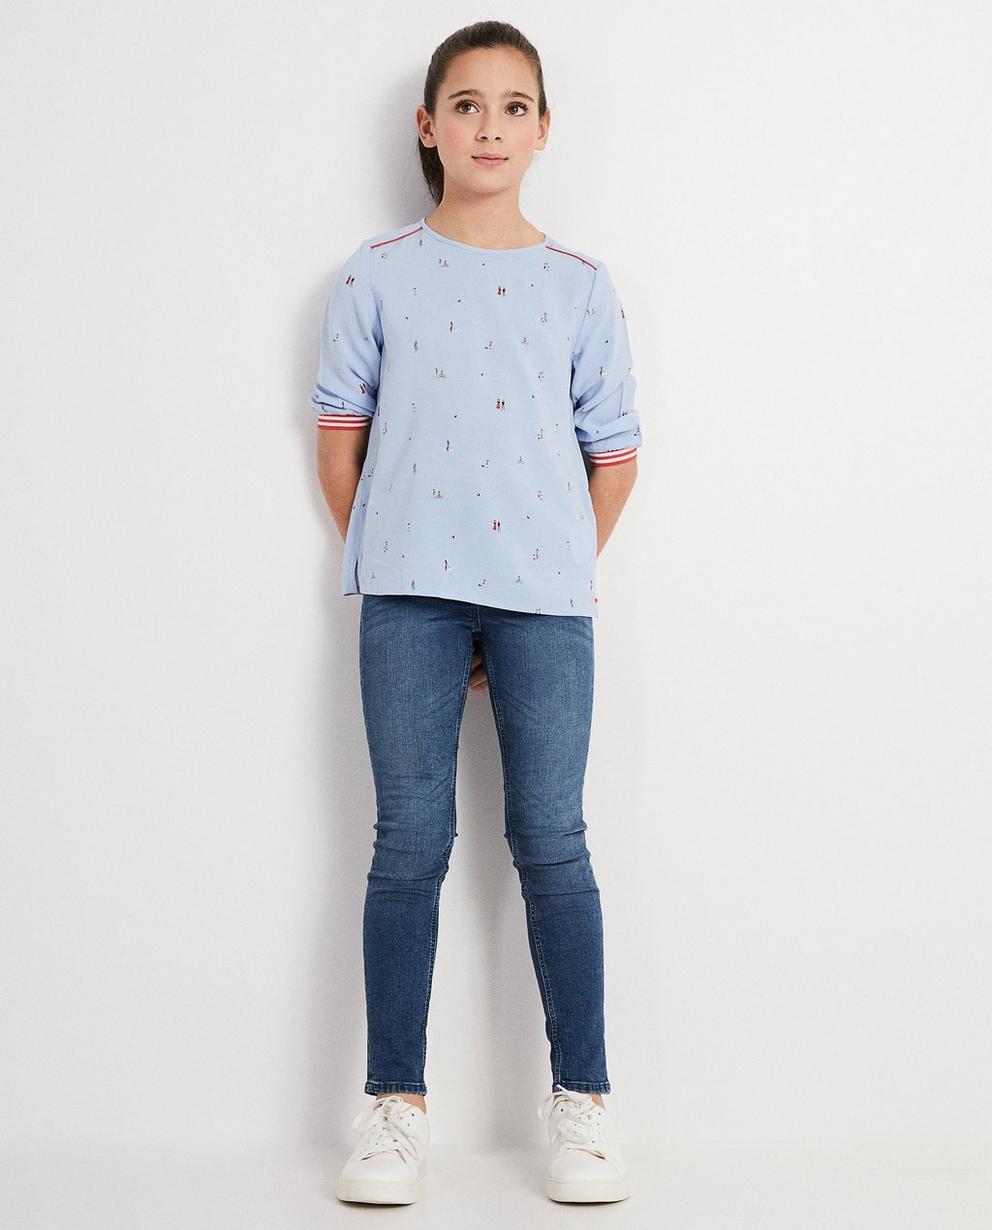 Bluse aus Viskose mit Print - I AM - I AM